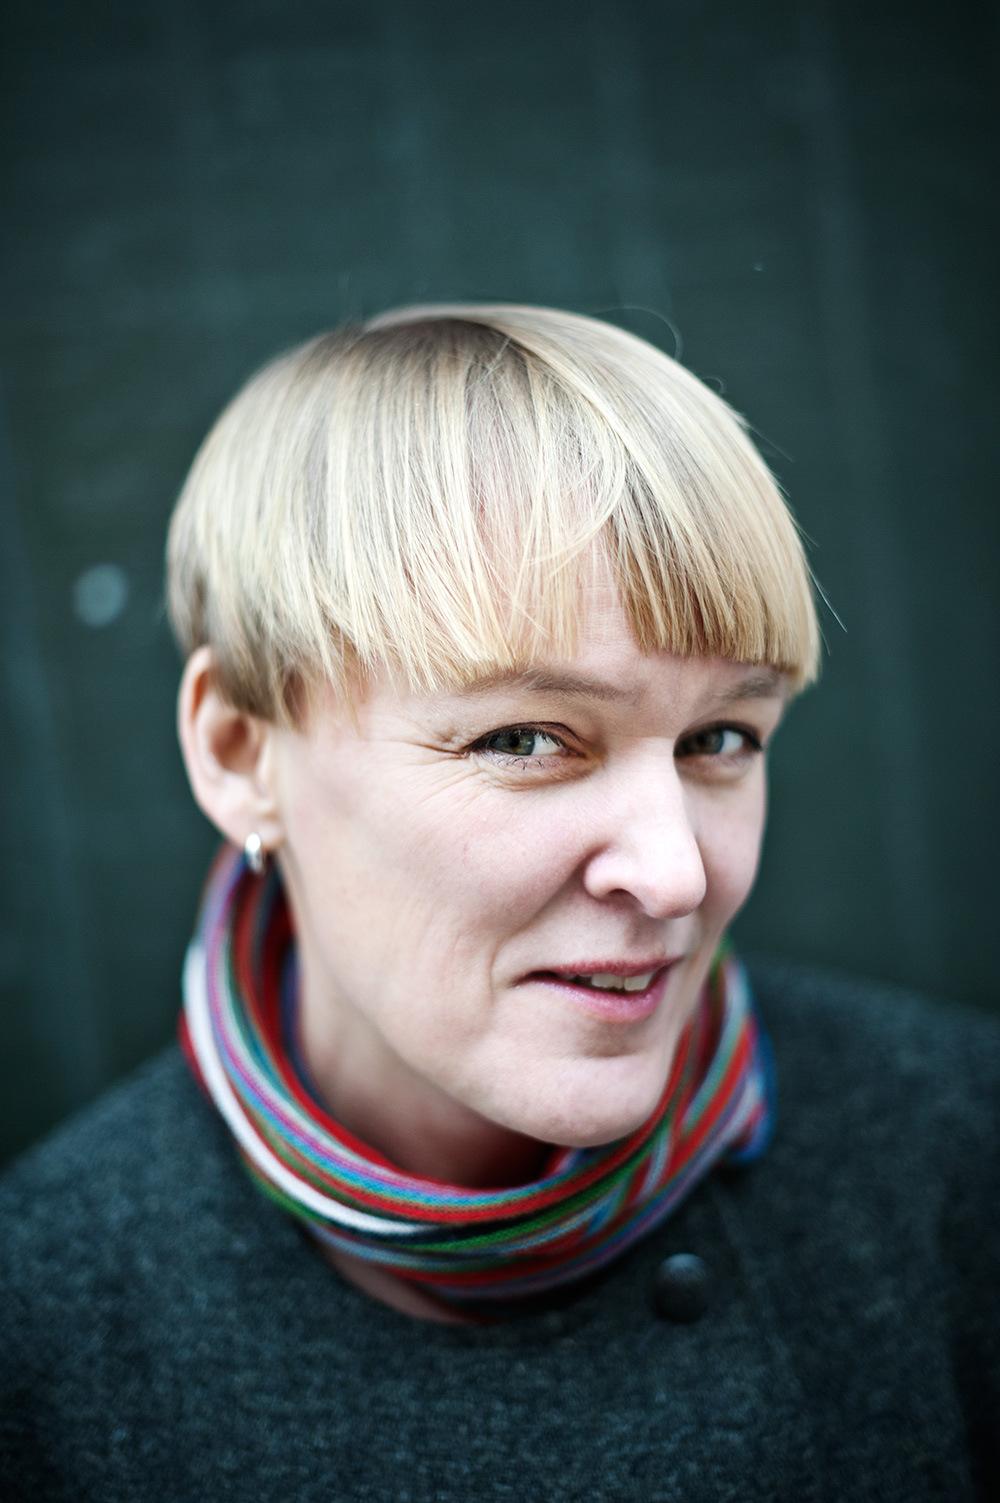 Mareike Timm | Photo Journalist - Maria Blom, Swedish director and screenwriter. For Fokus, 2014.